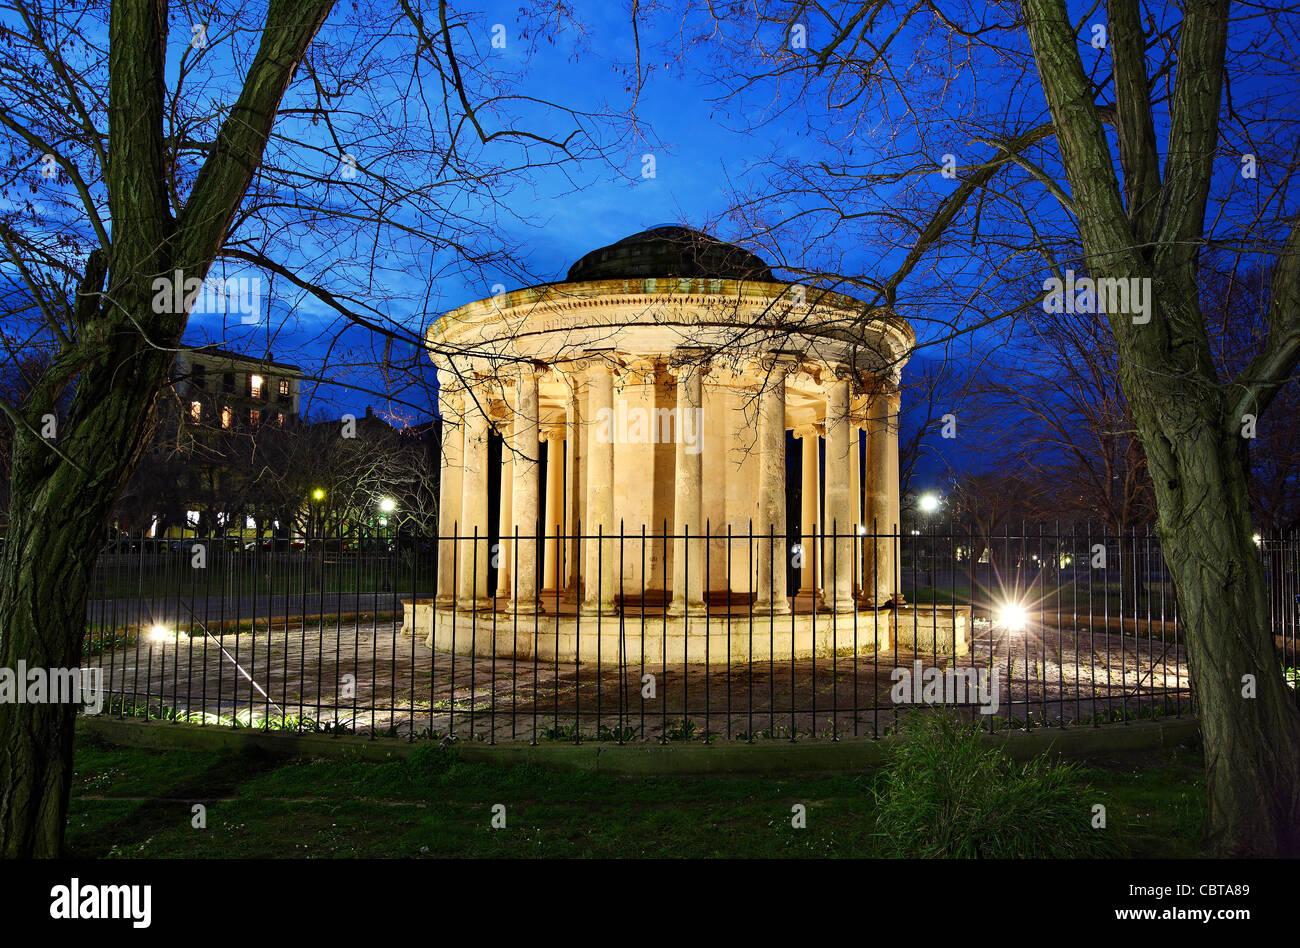 The Maitland's Rotonda (Rotunda) at the end of Spianada square (esplanade) of Corfu town, Corfu ('Kerkyra') - Stock Image